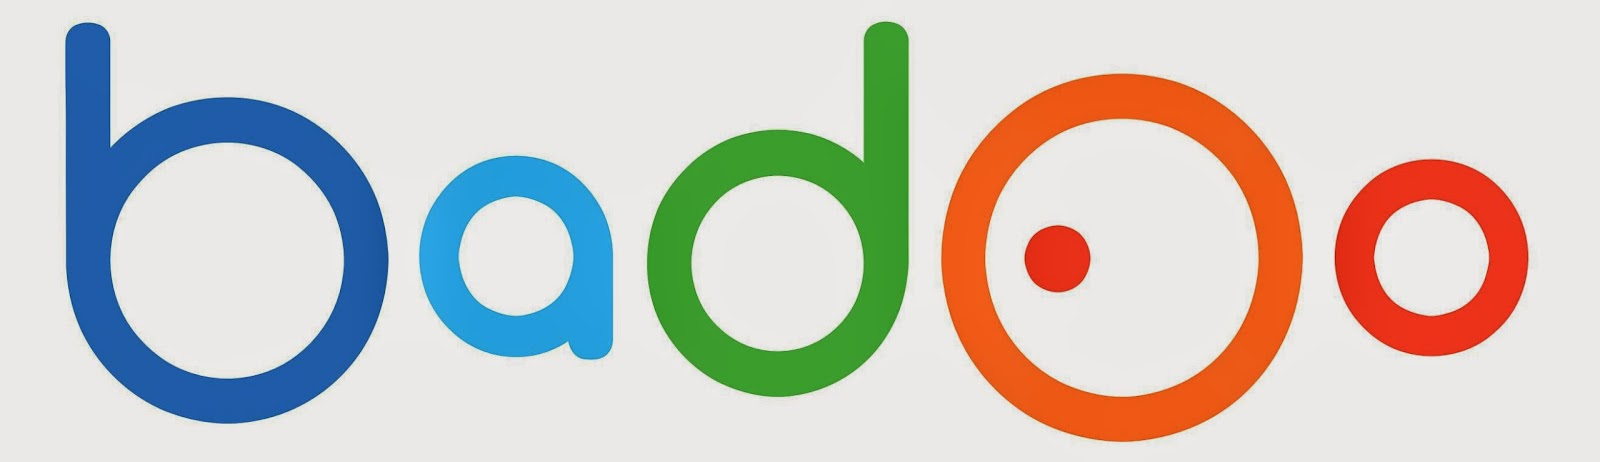 badoo dating site